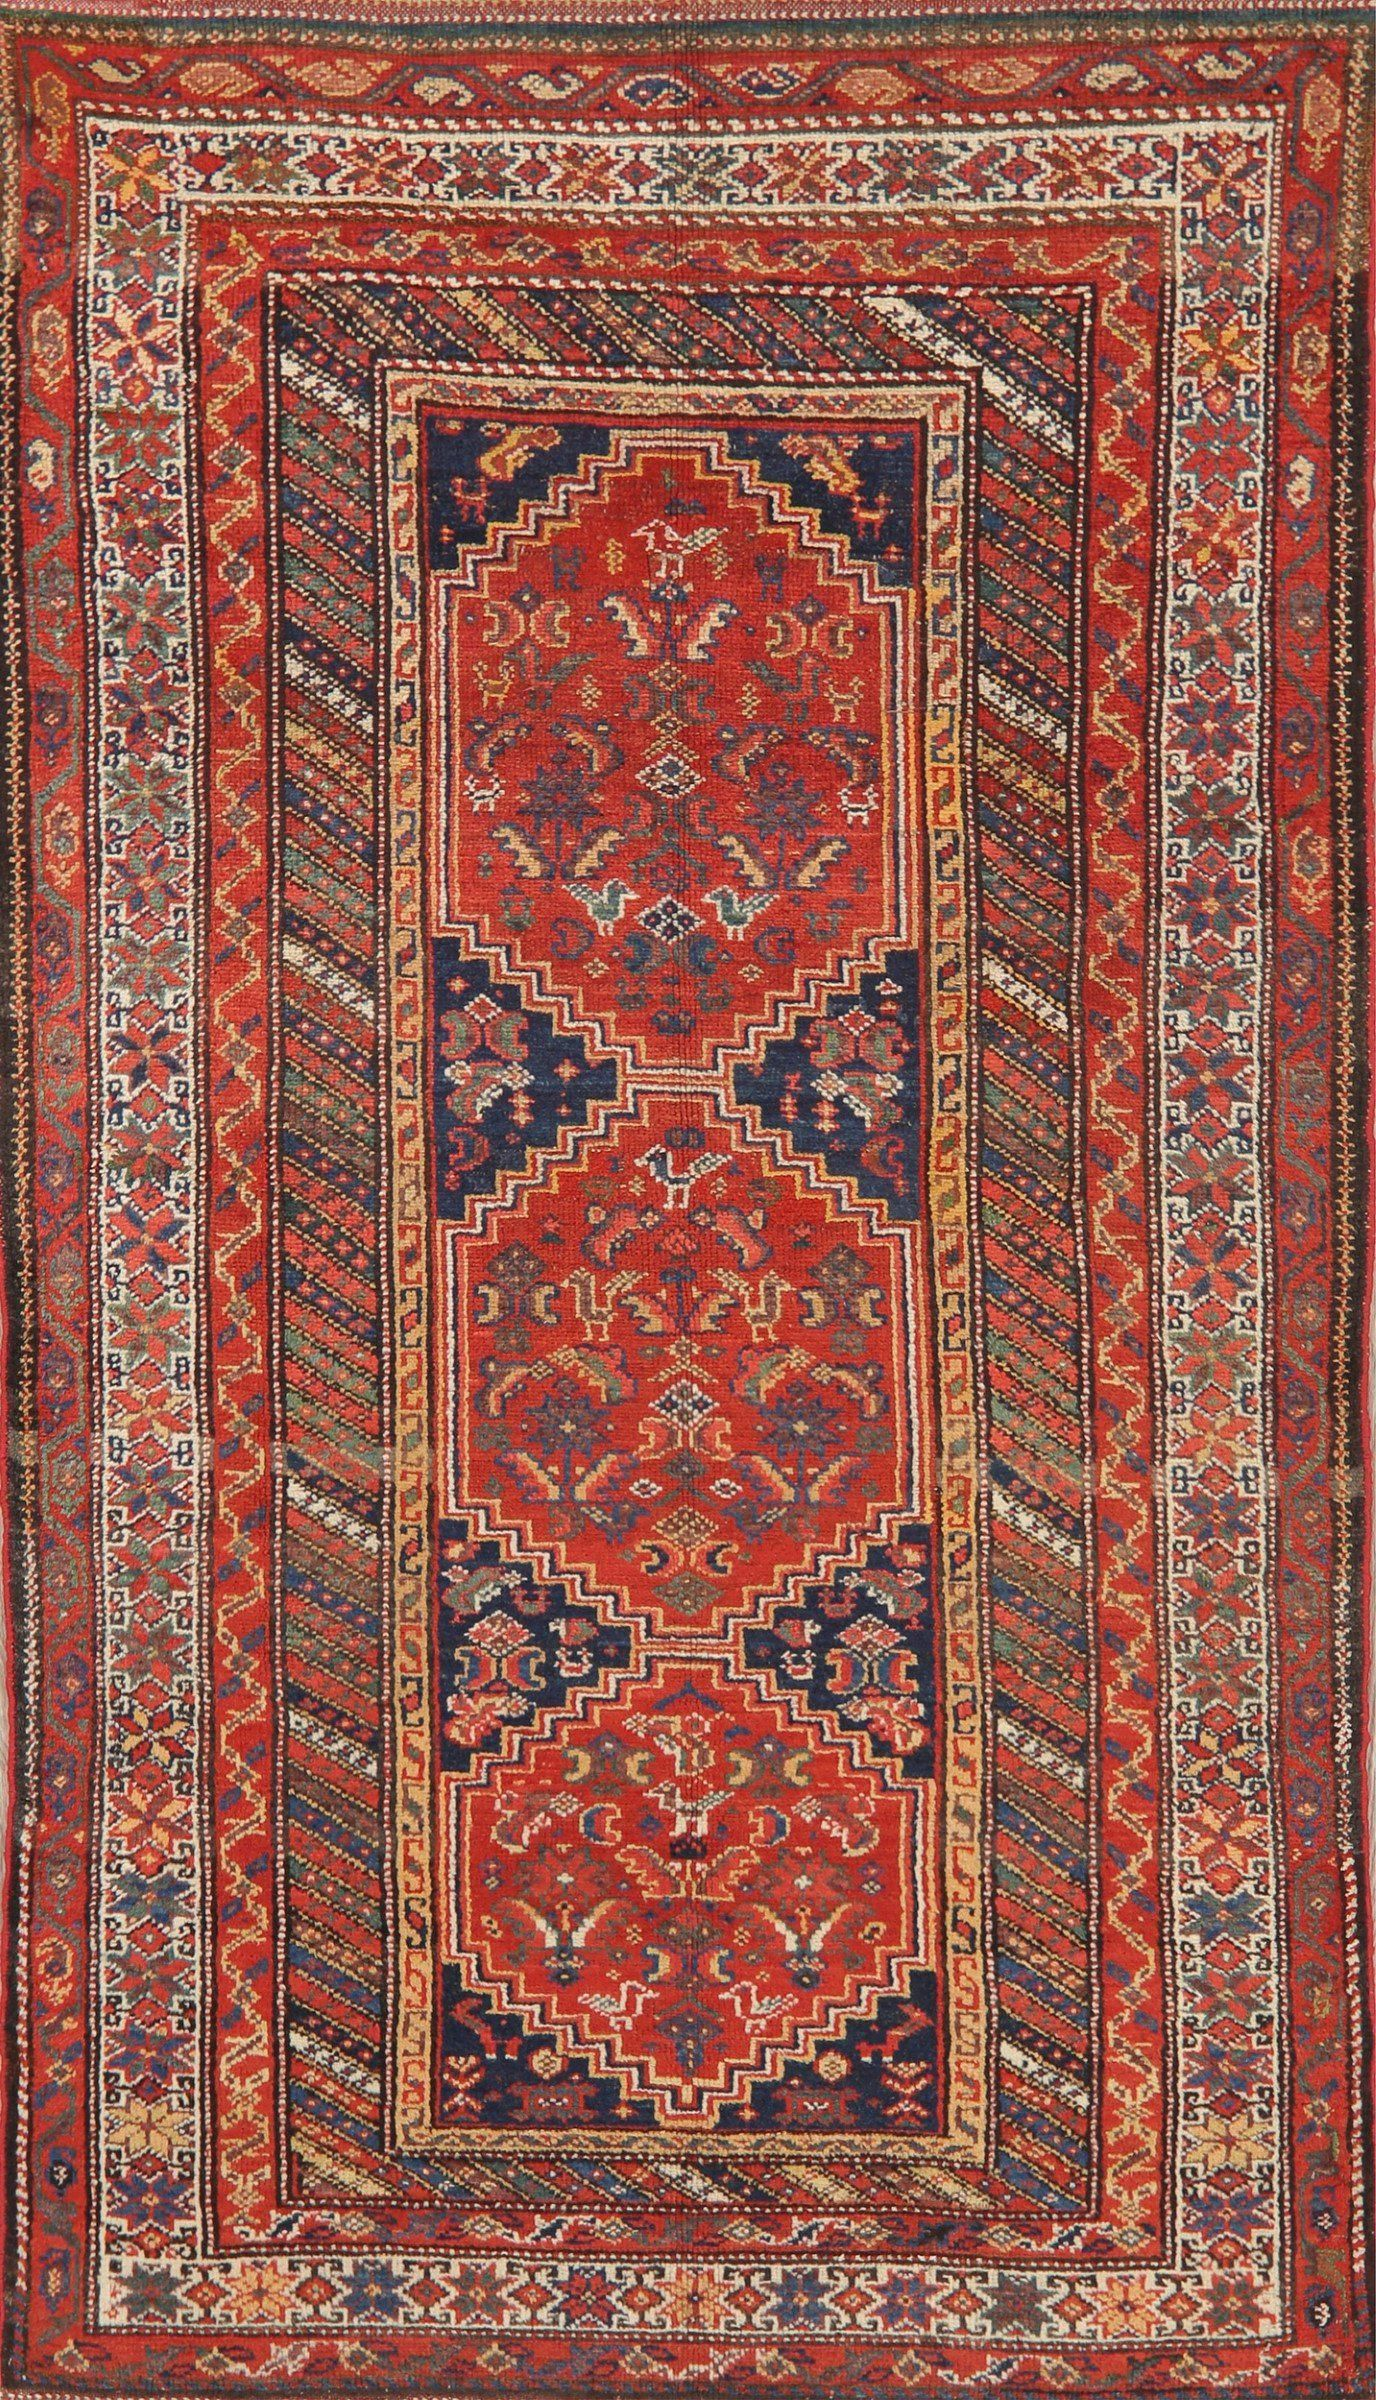 Pre-1900 Antique Vegetable Dye Bidjar Persian Area Rug